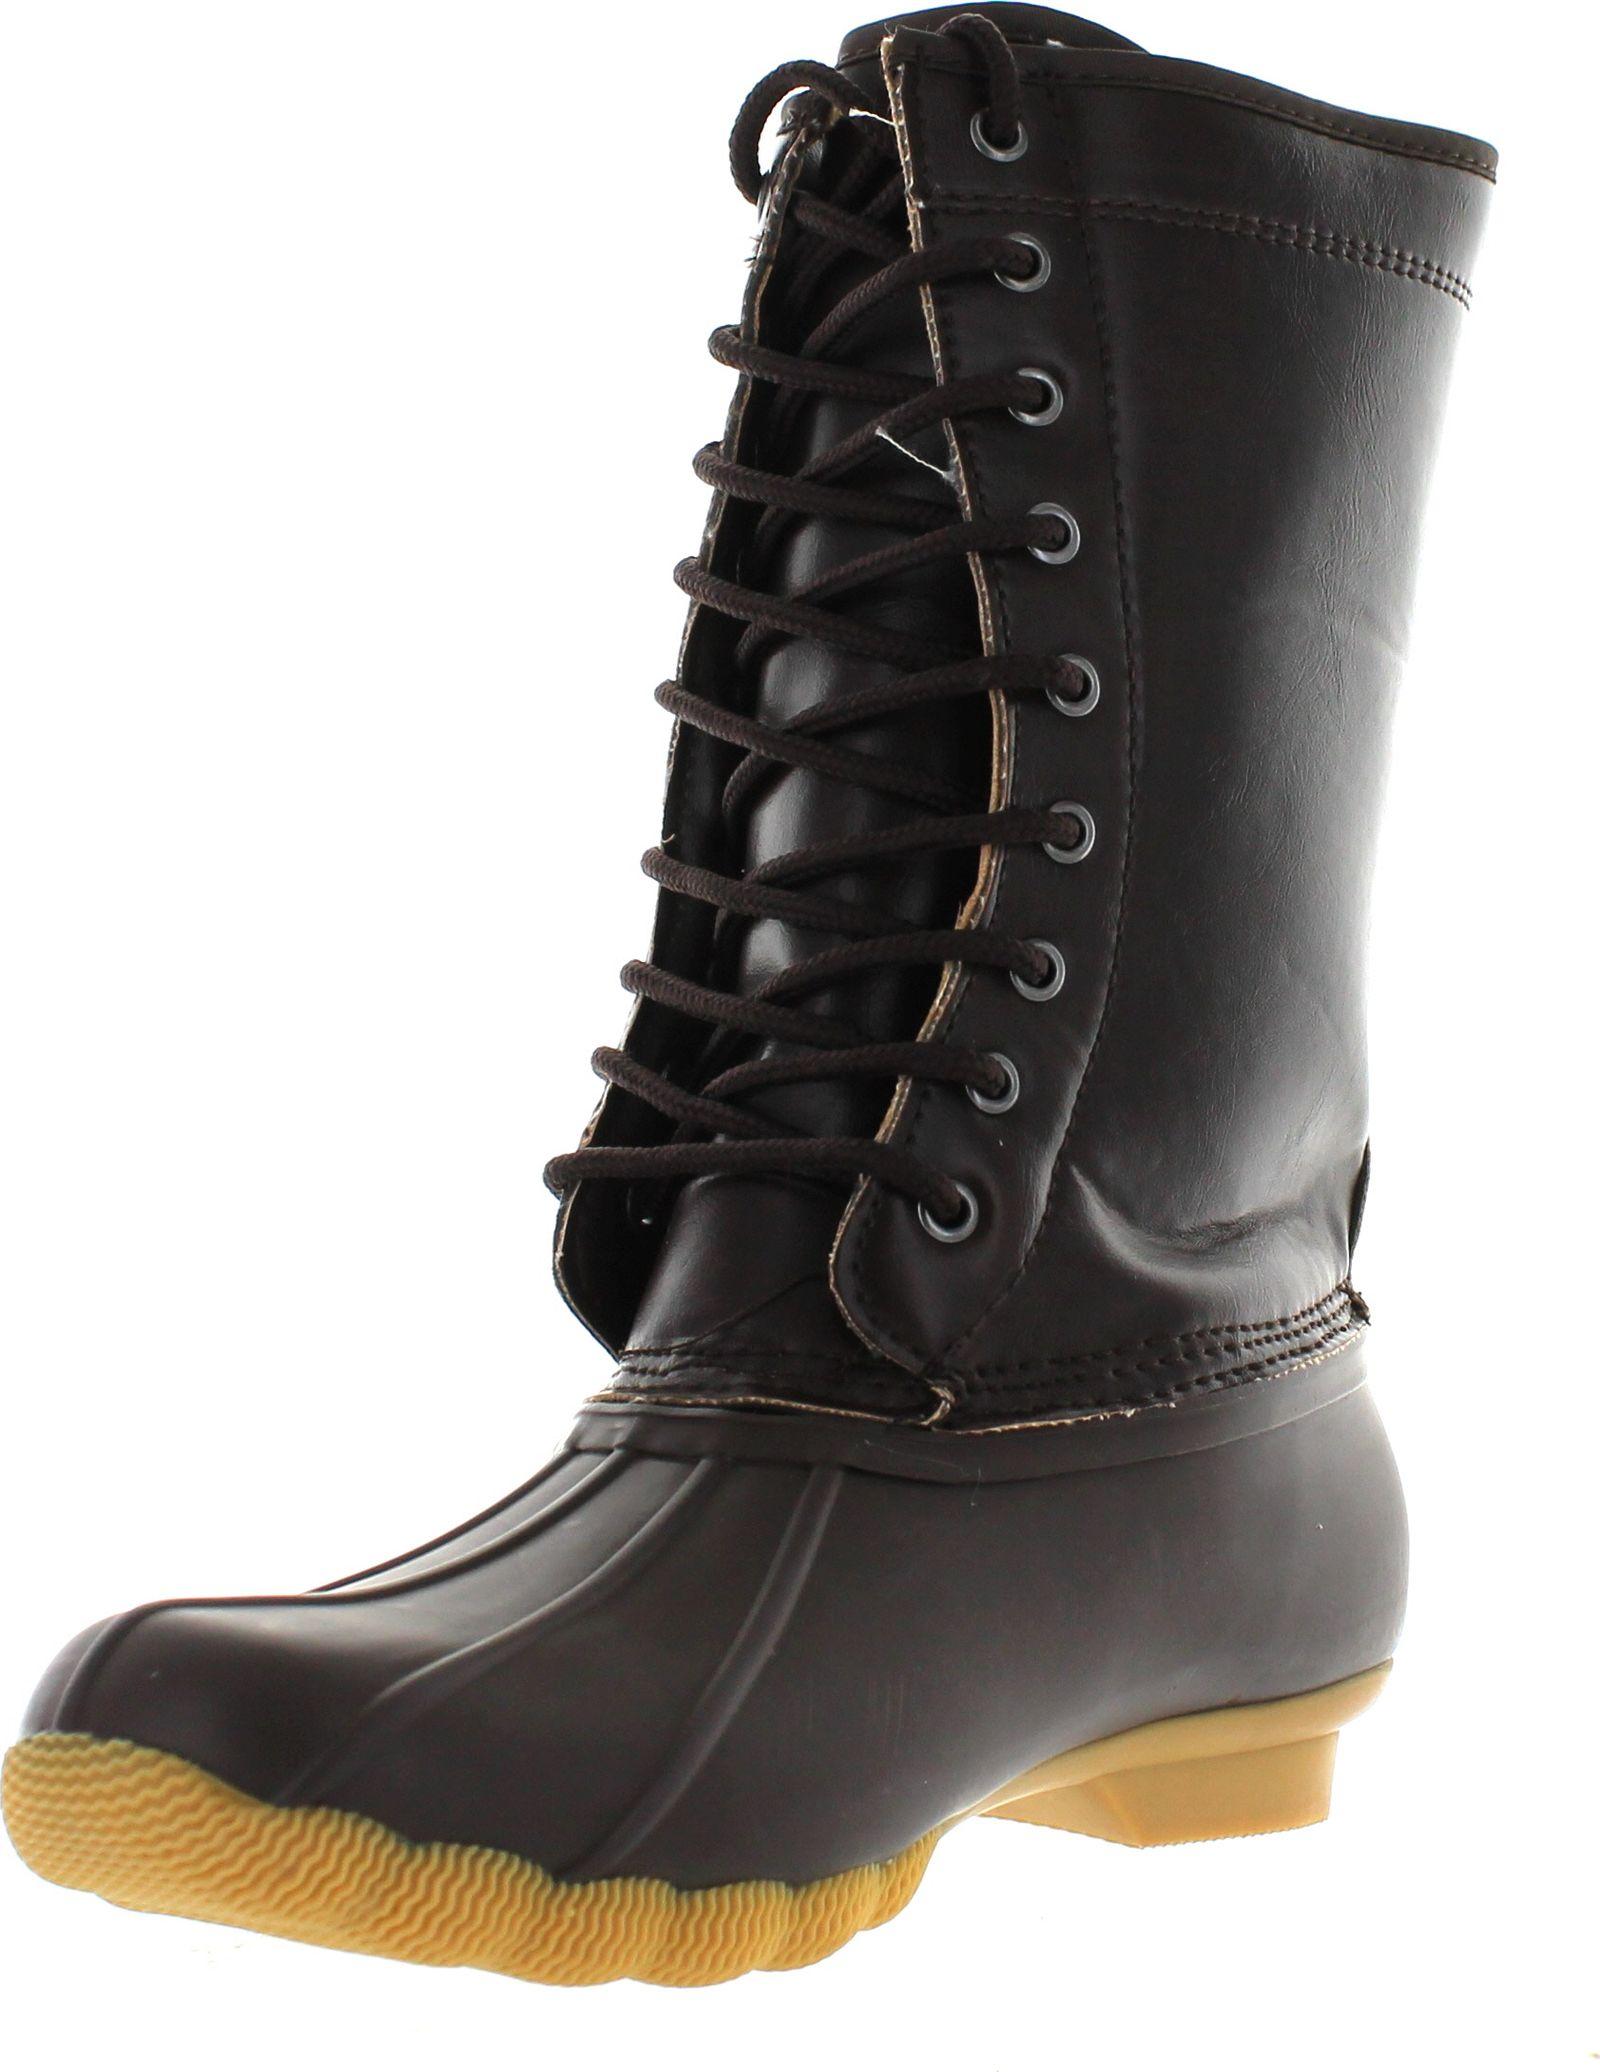 Model Womens Hunter Original Adjustable Back Short Snow Waterproof Rain Boots US 5-11 | EBay